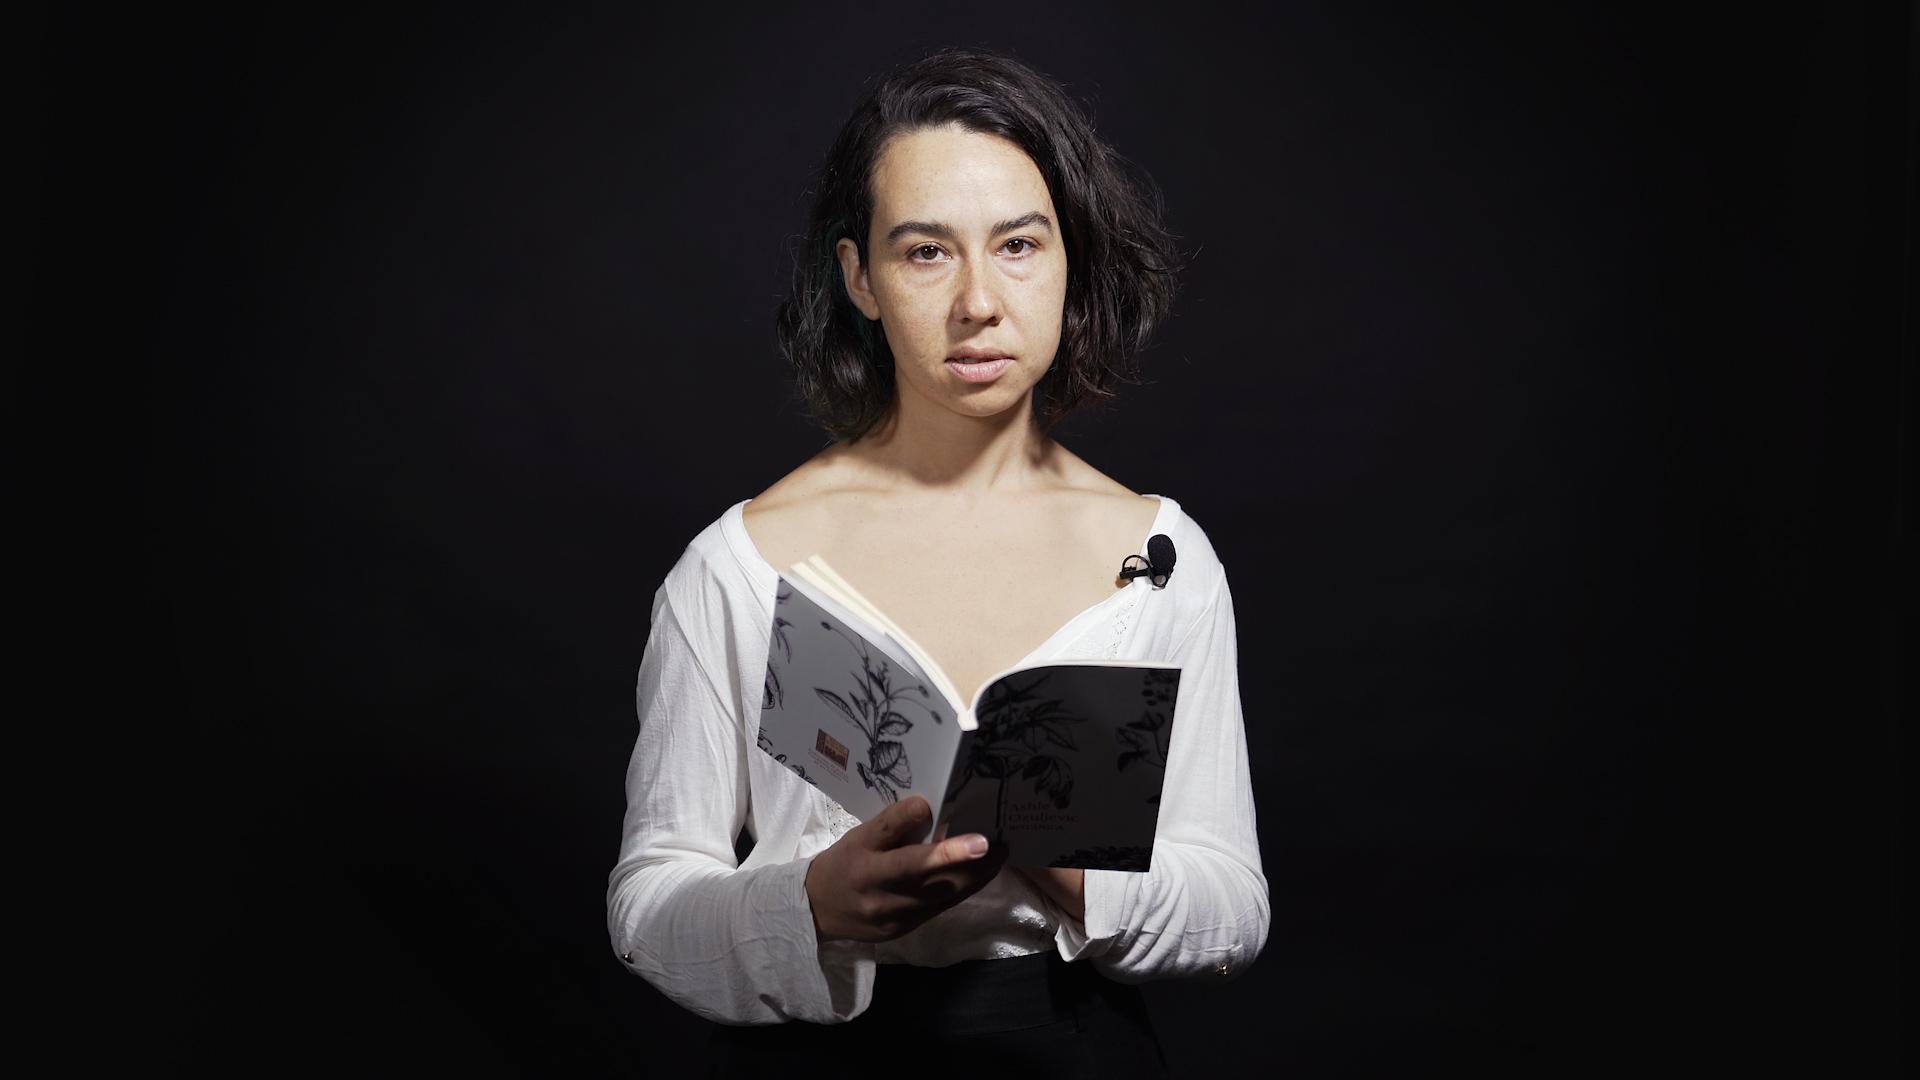 Barcelona Poesía: Ashle Ozuljevic recita 'Lathyrus Odoratus'